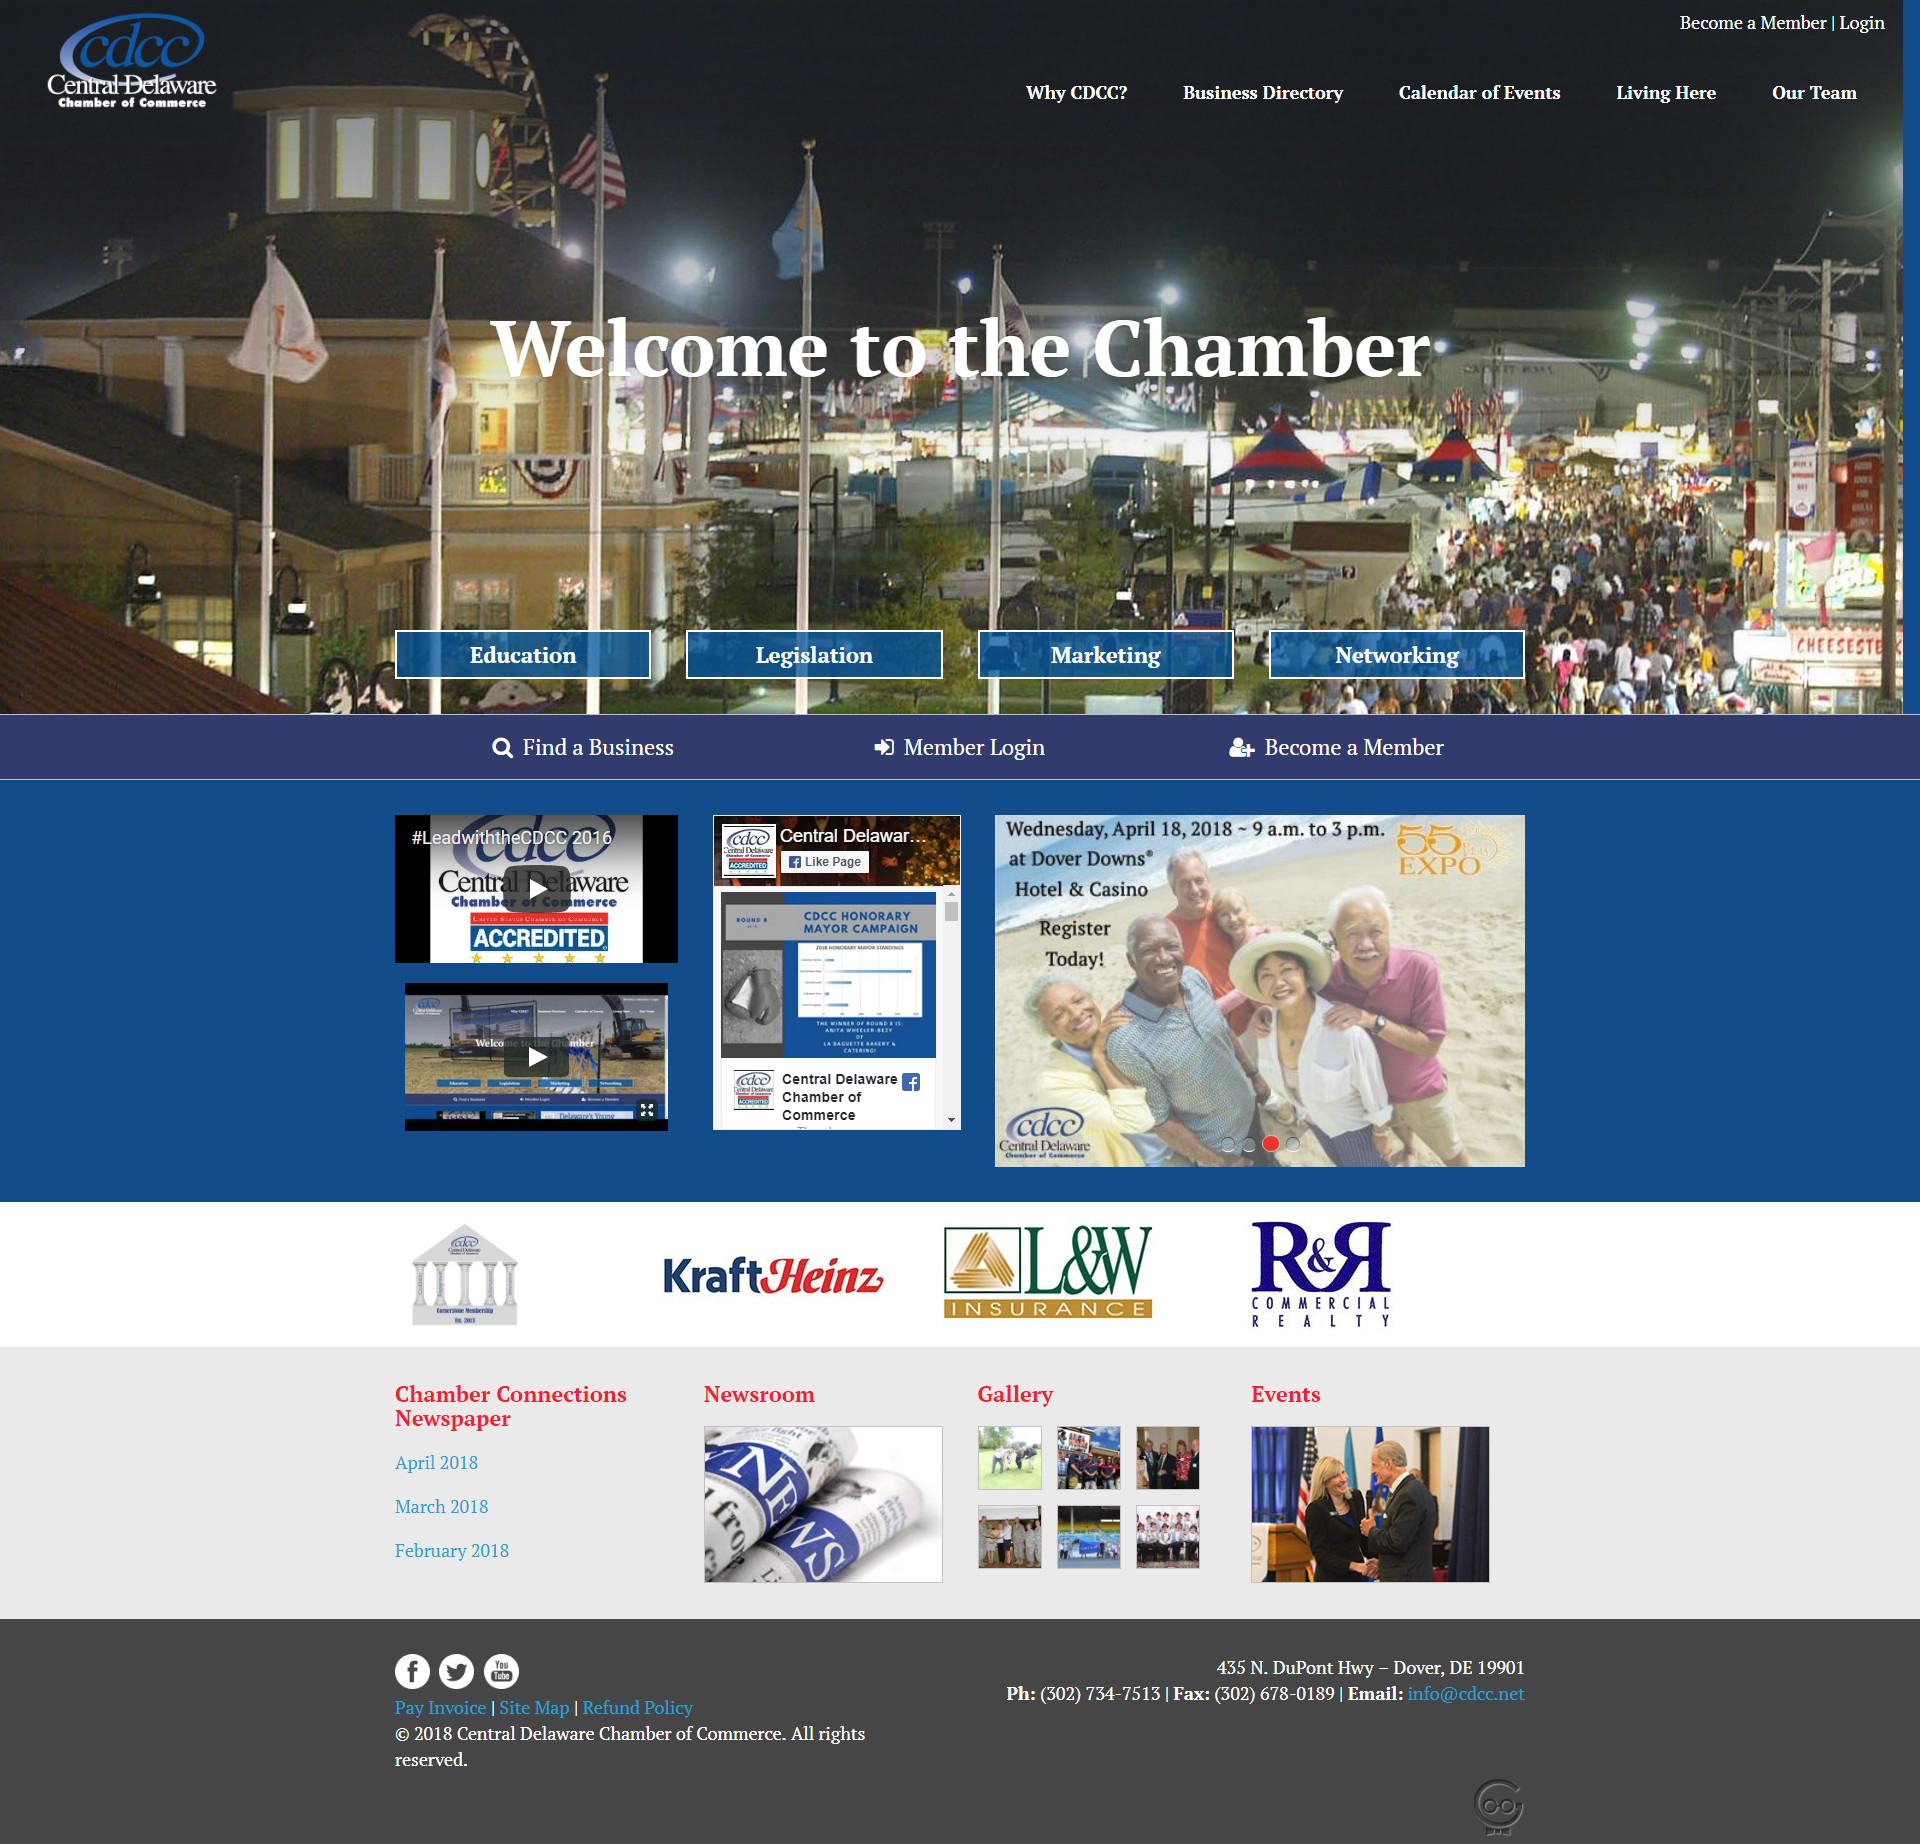 Central Delaware Chamber of Commerce